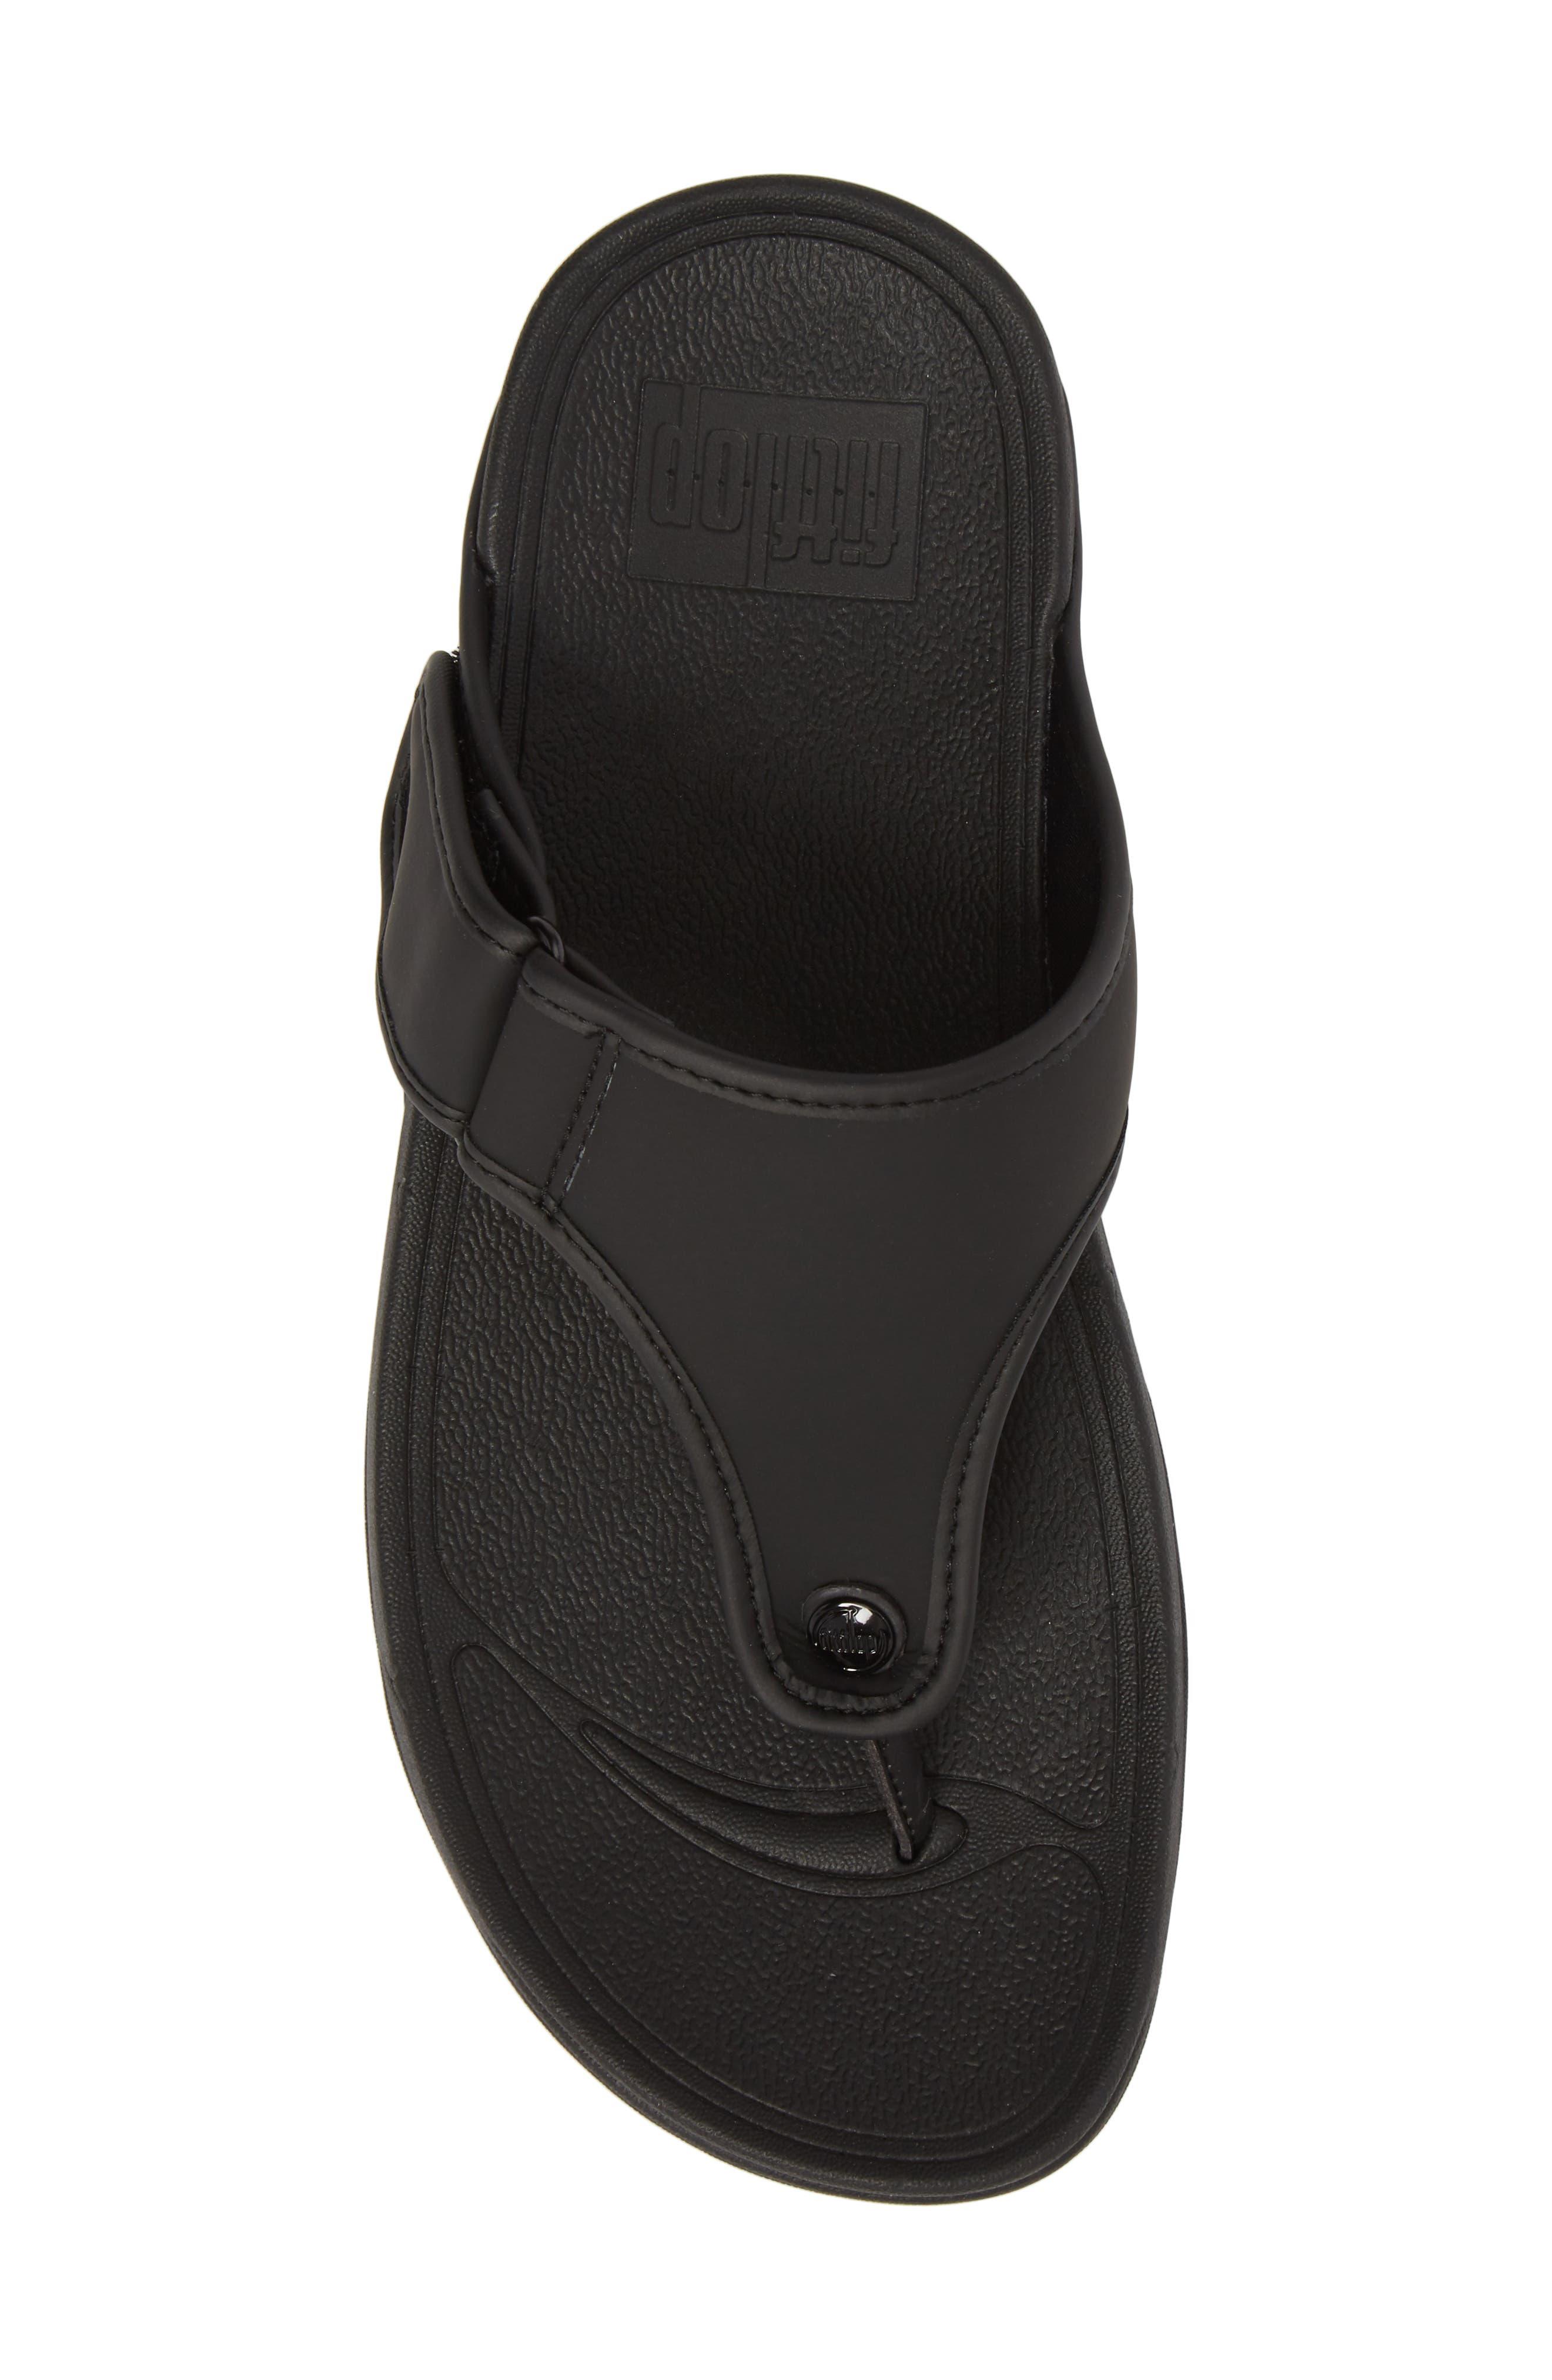 FITFLOP, Trakk<sup>™</sup> II Sandal, Alternate thumbnail 5, color, BLACK NEOPRENE